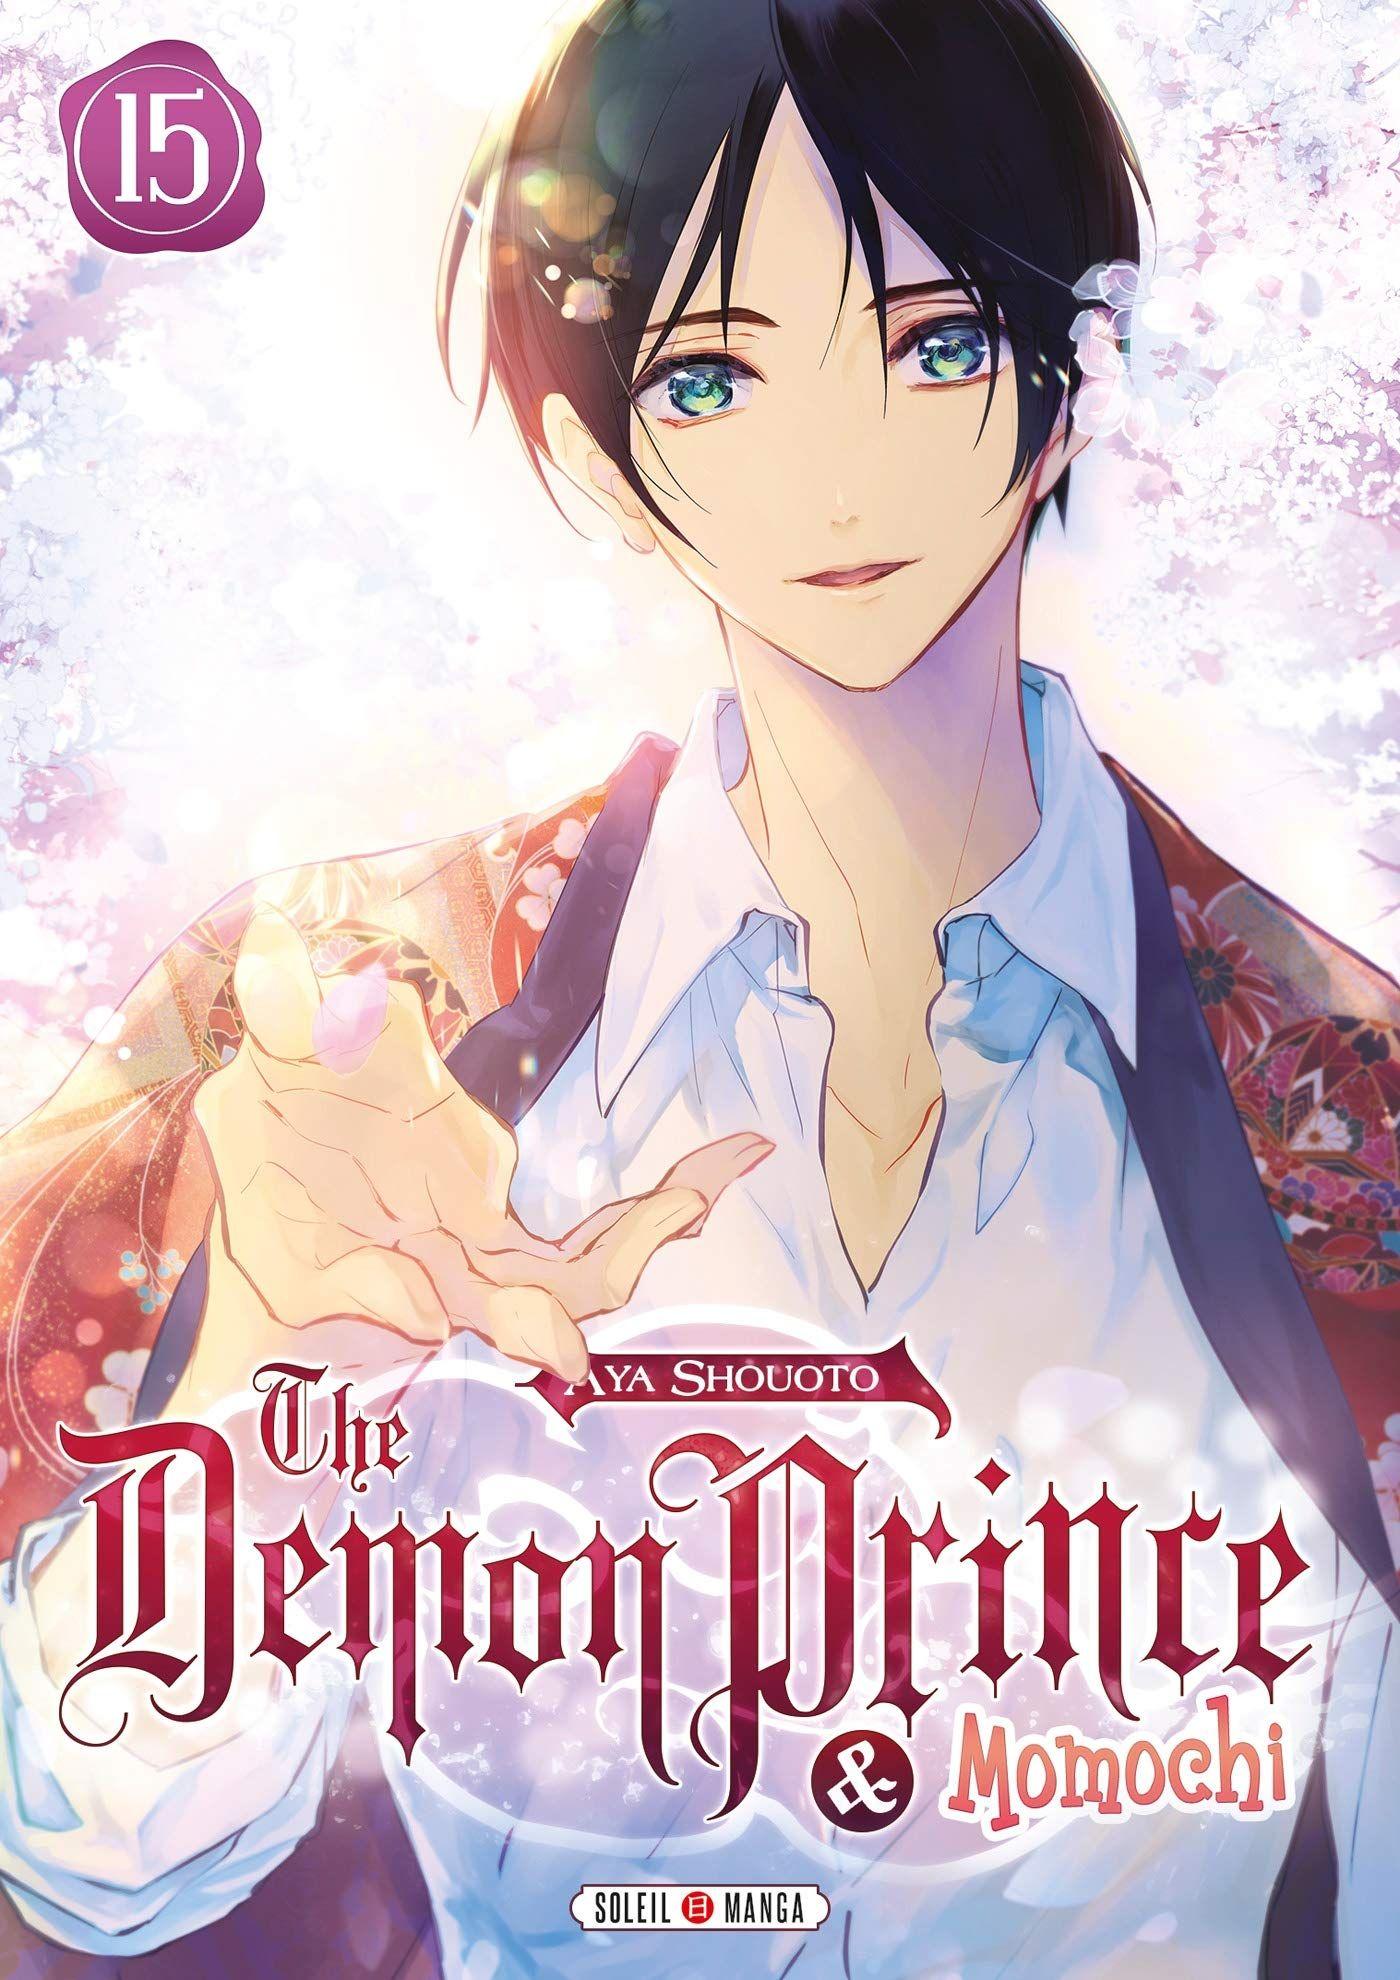 Sortie Manga au Québec JUIN 2021 Demon_prince_and_Momochi_15_soleil